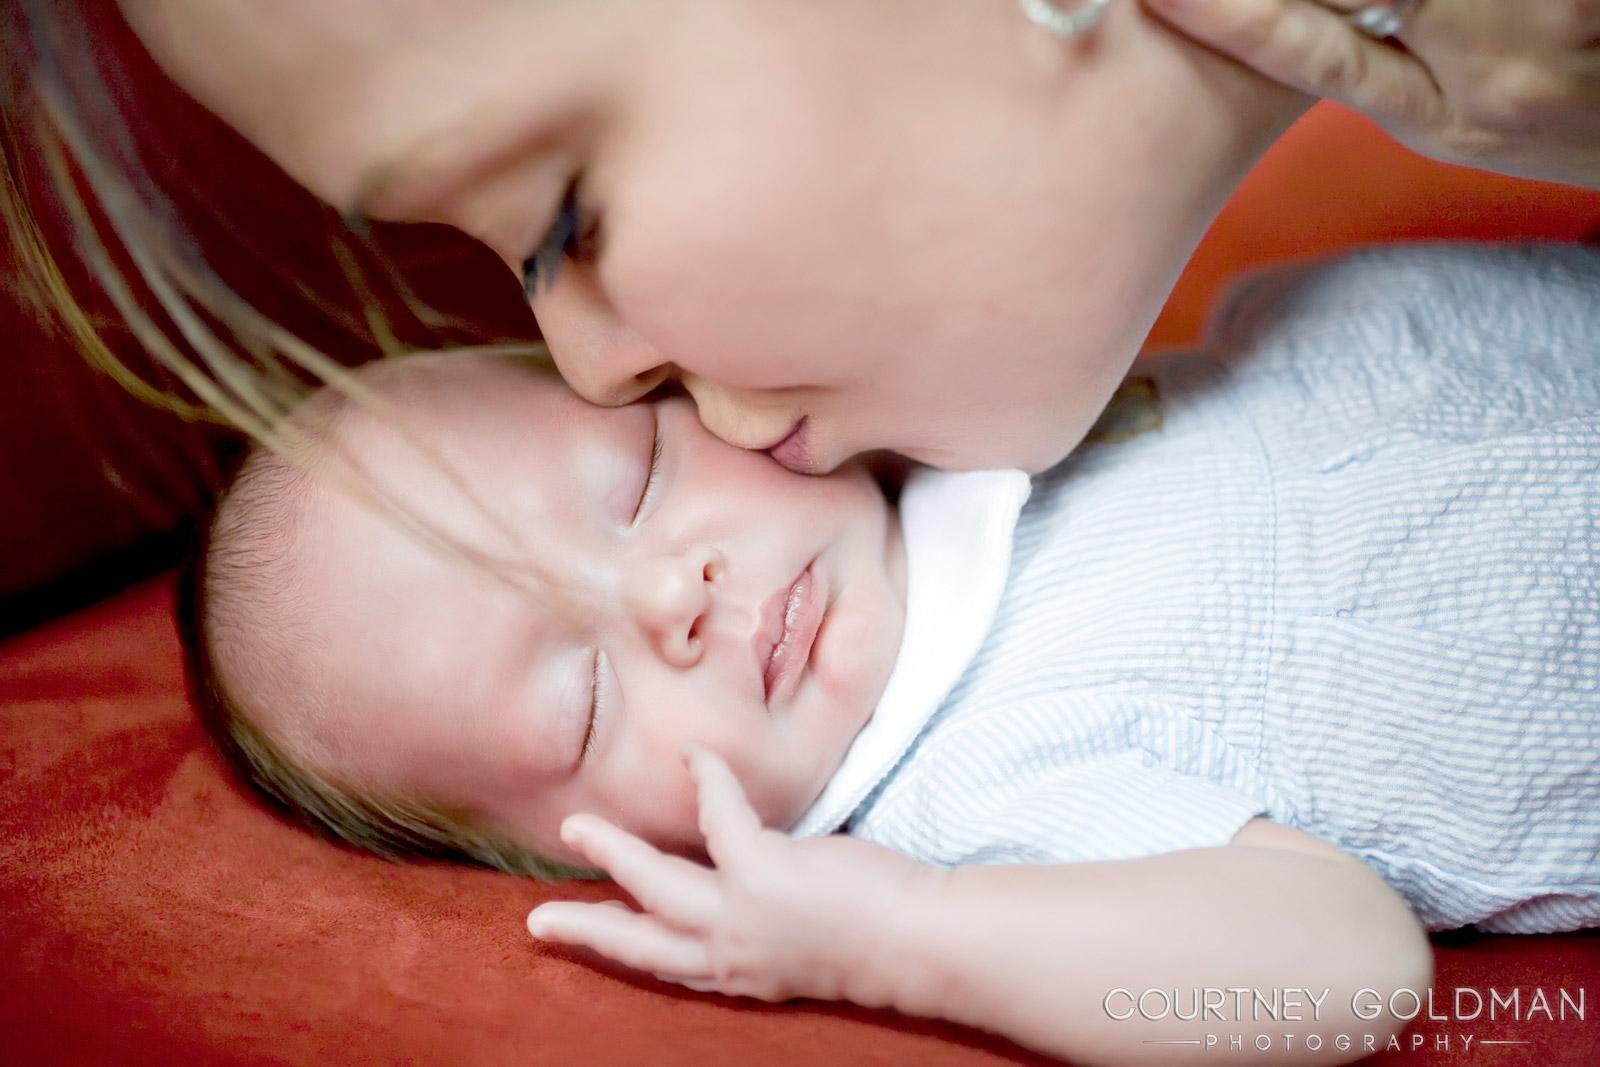 Atlanta Maternity and Newborn Photography by Courtney Goldman 47.jpg